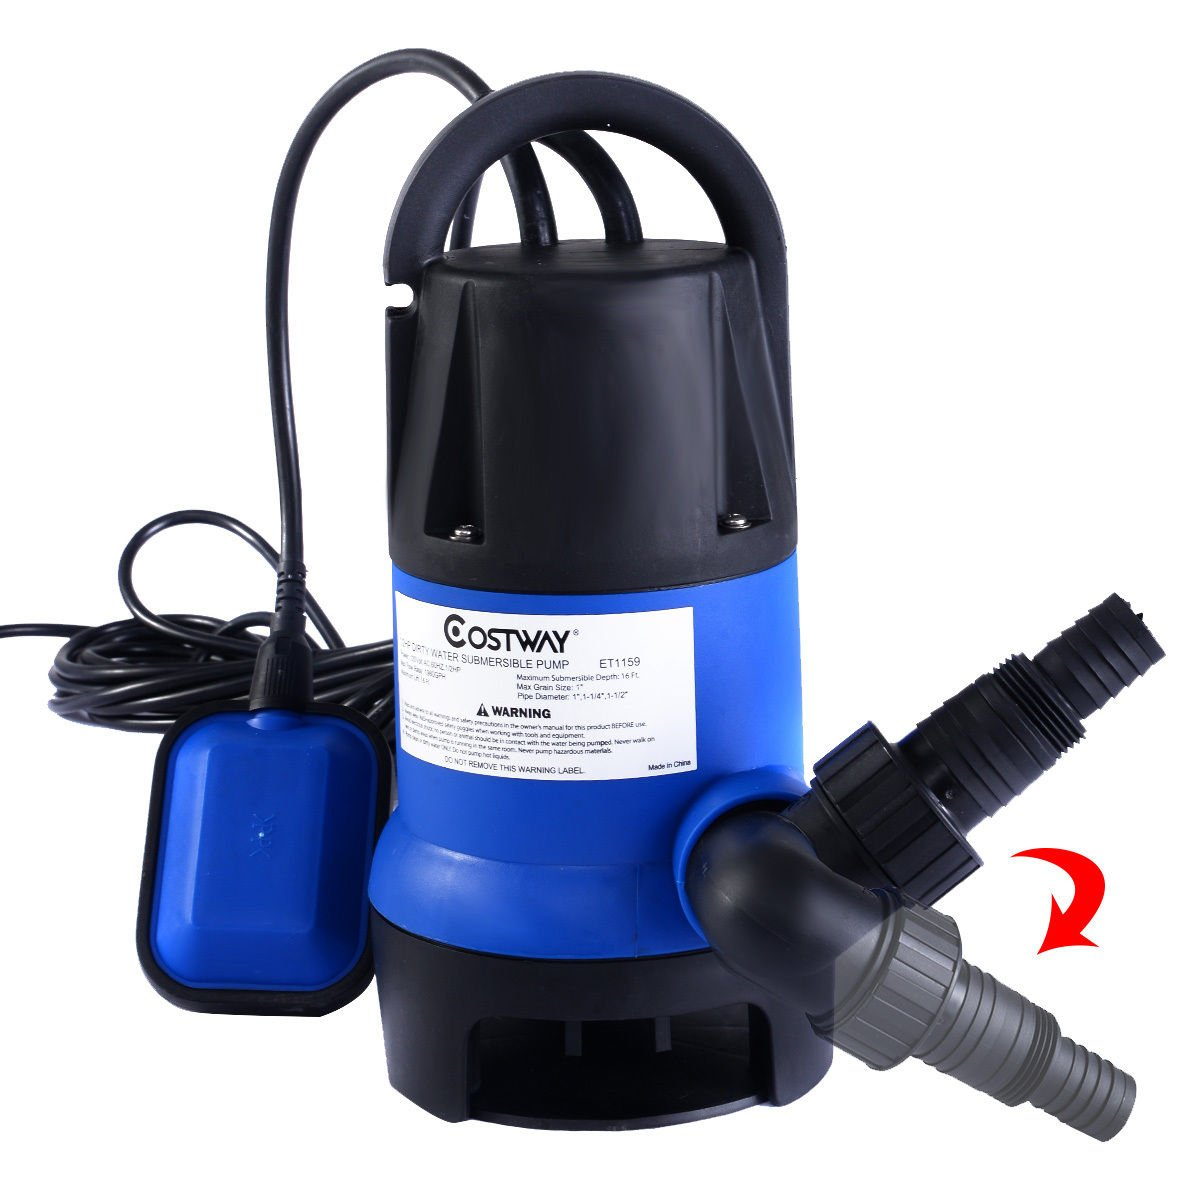 Goplus 1/2HP Submersible Dirty Clean Water Pump Flooding Pool Garden Tool Swimming Pool